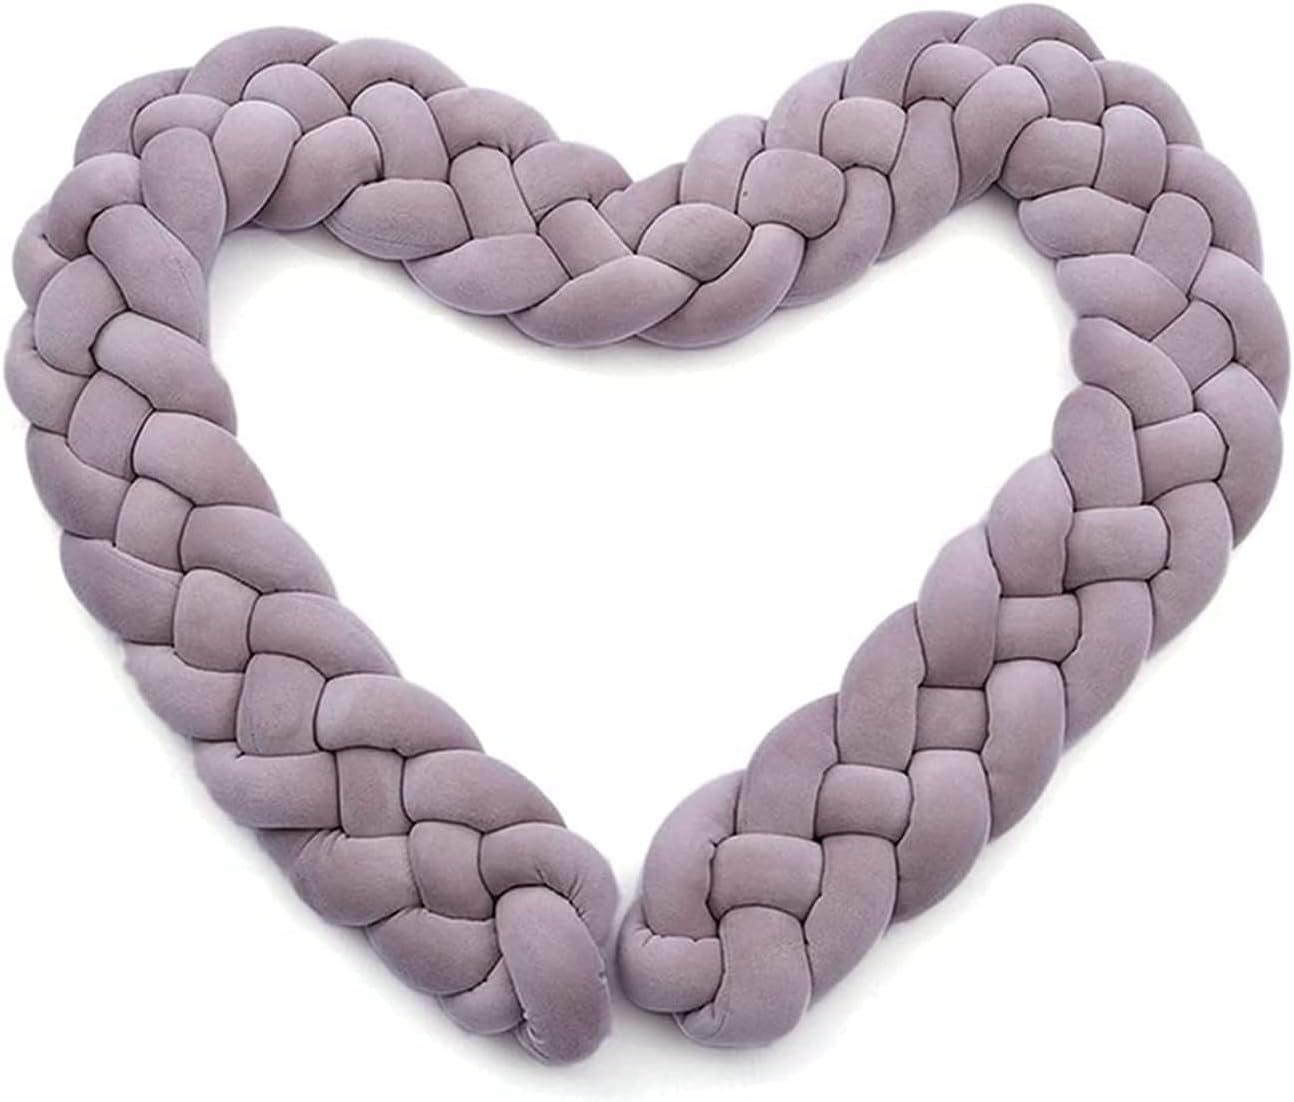 Fashionable JIU SI Cushion Crystal Velvet Pillow Braided Knot Lowest price challenge Soft Handmade